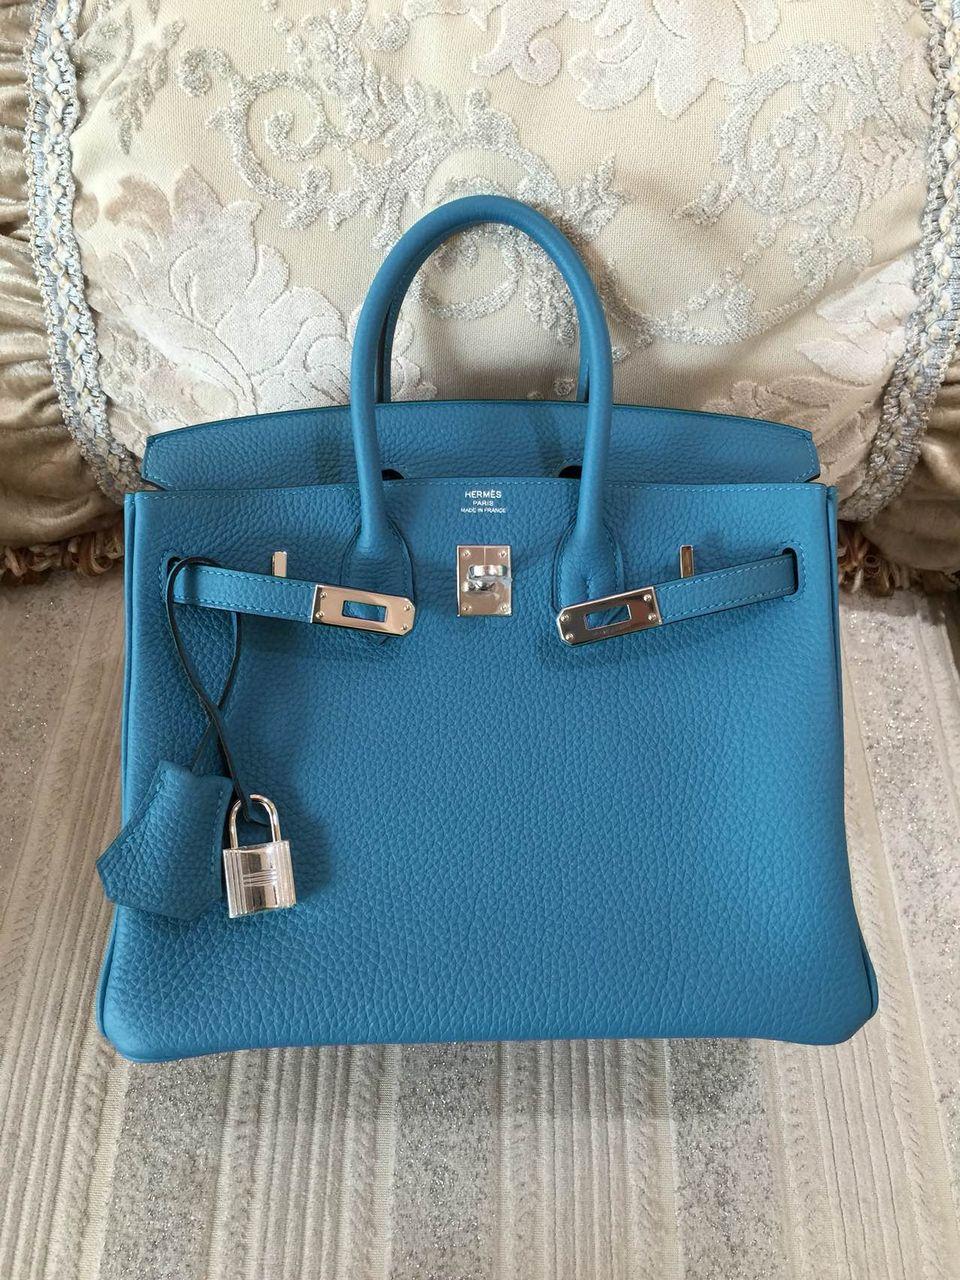 Hermes Birkin Bag 25cm Price